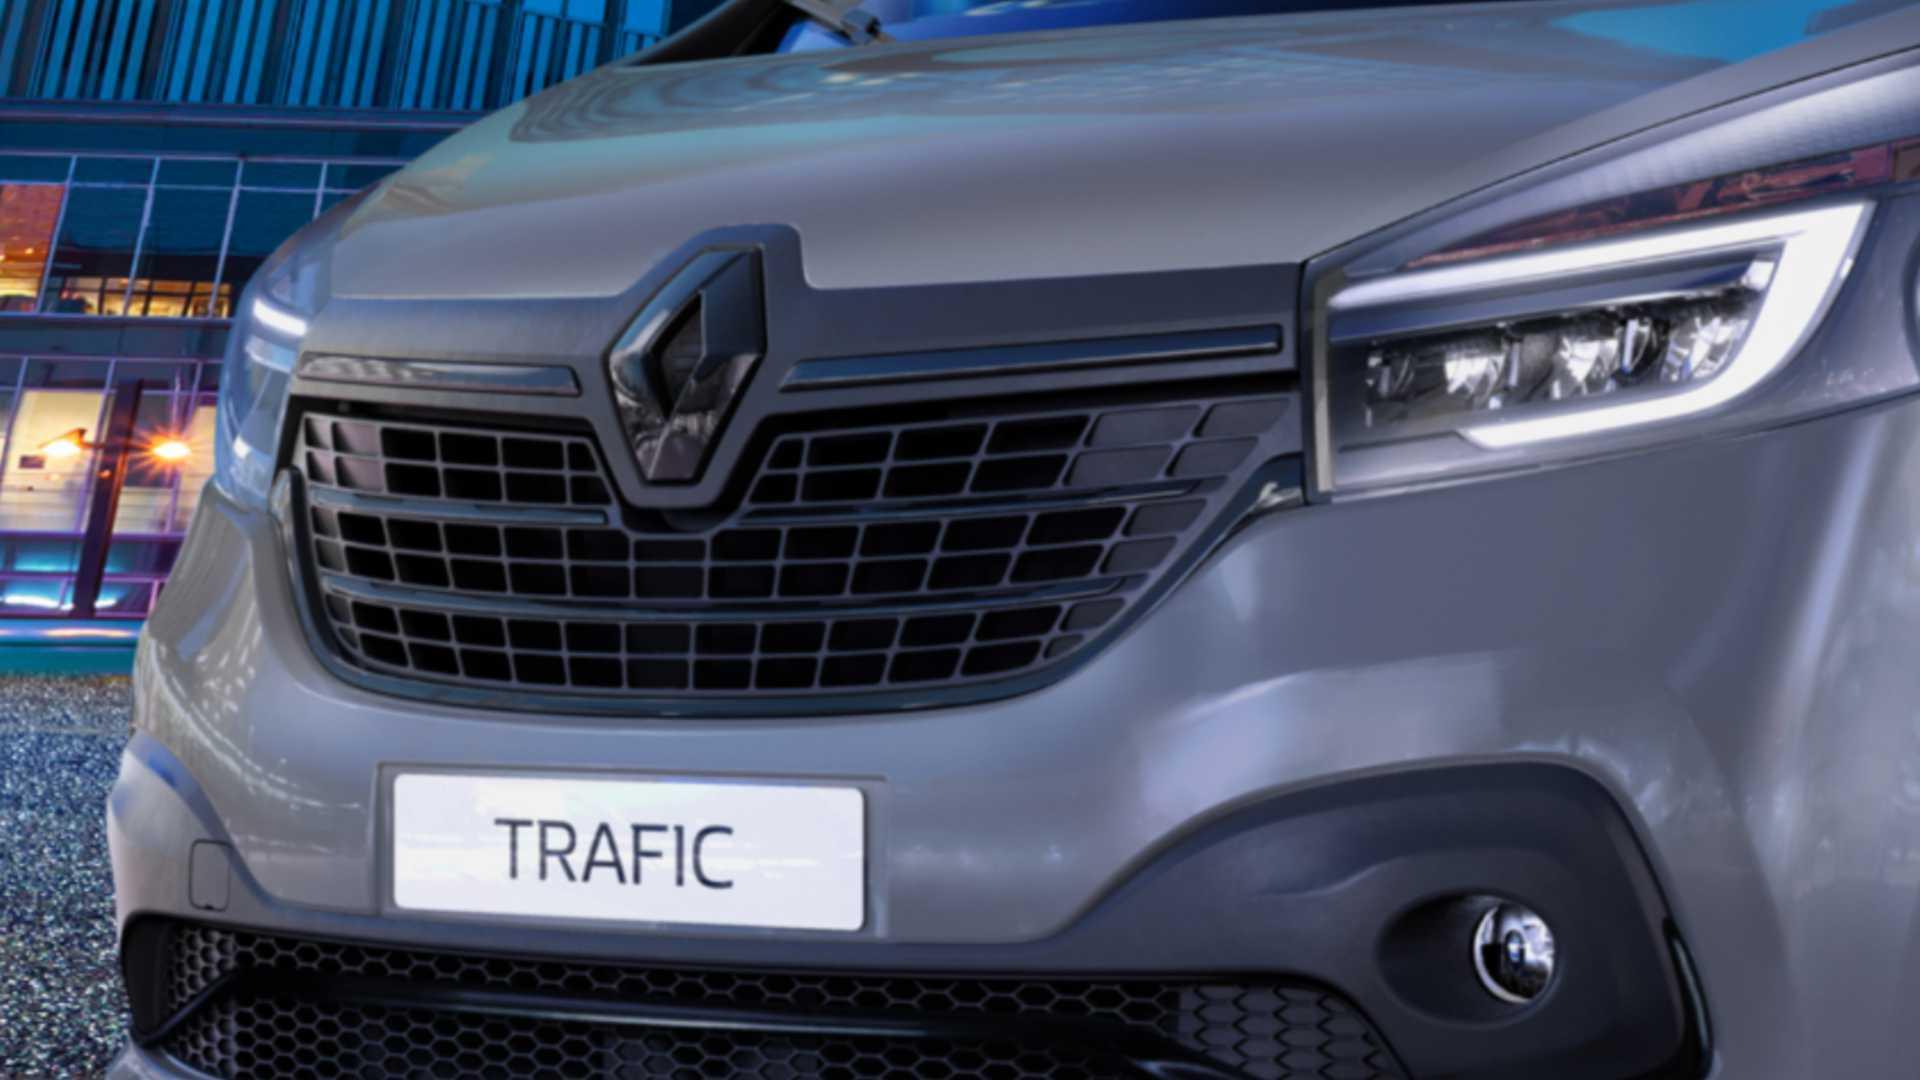 Renault Adds New 28k Black Edition To Trafic Van Line Up